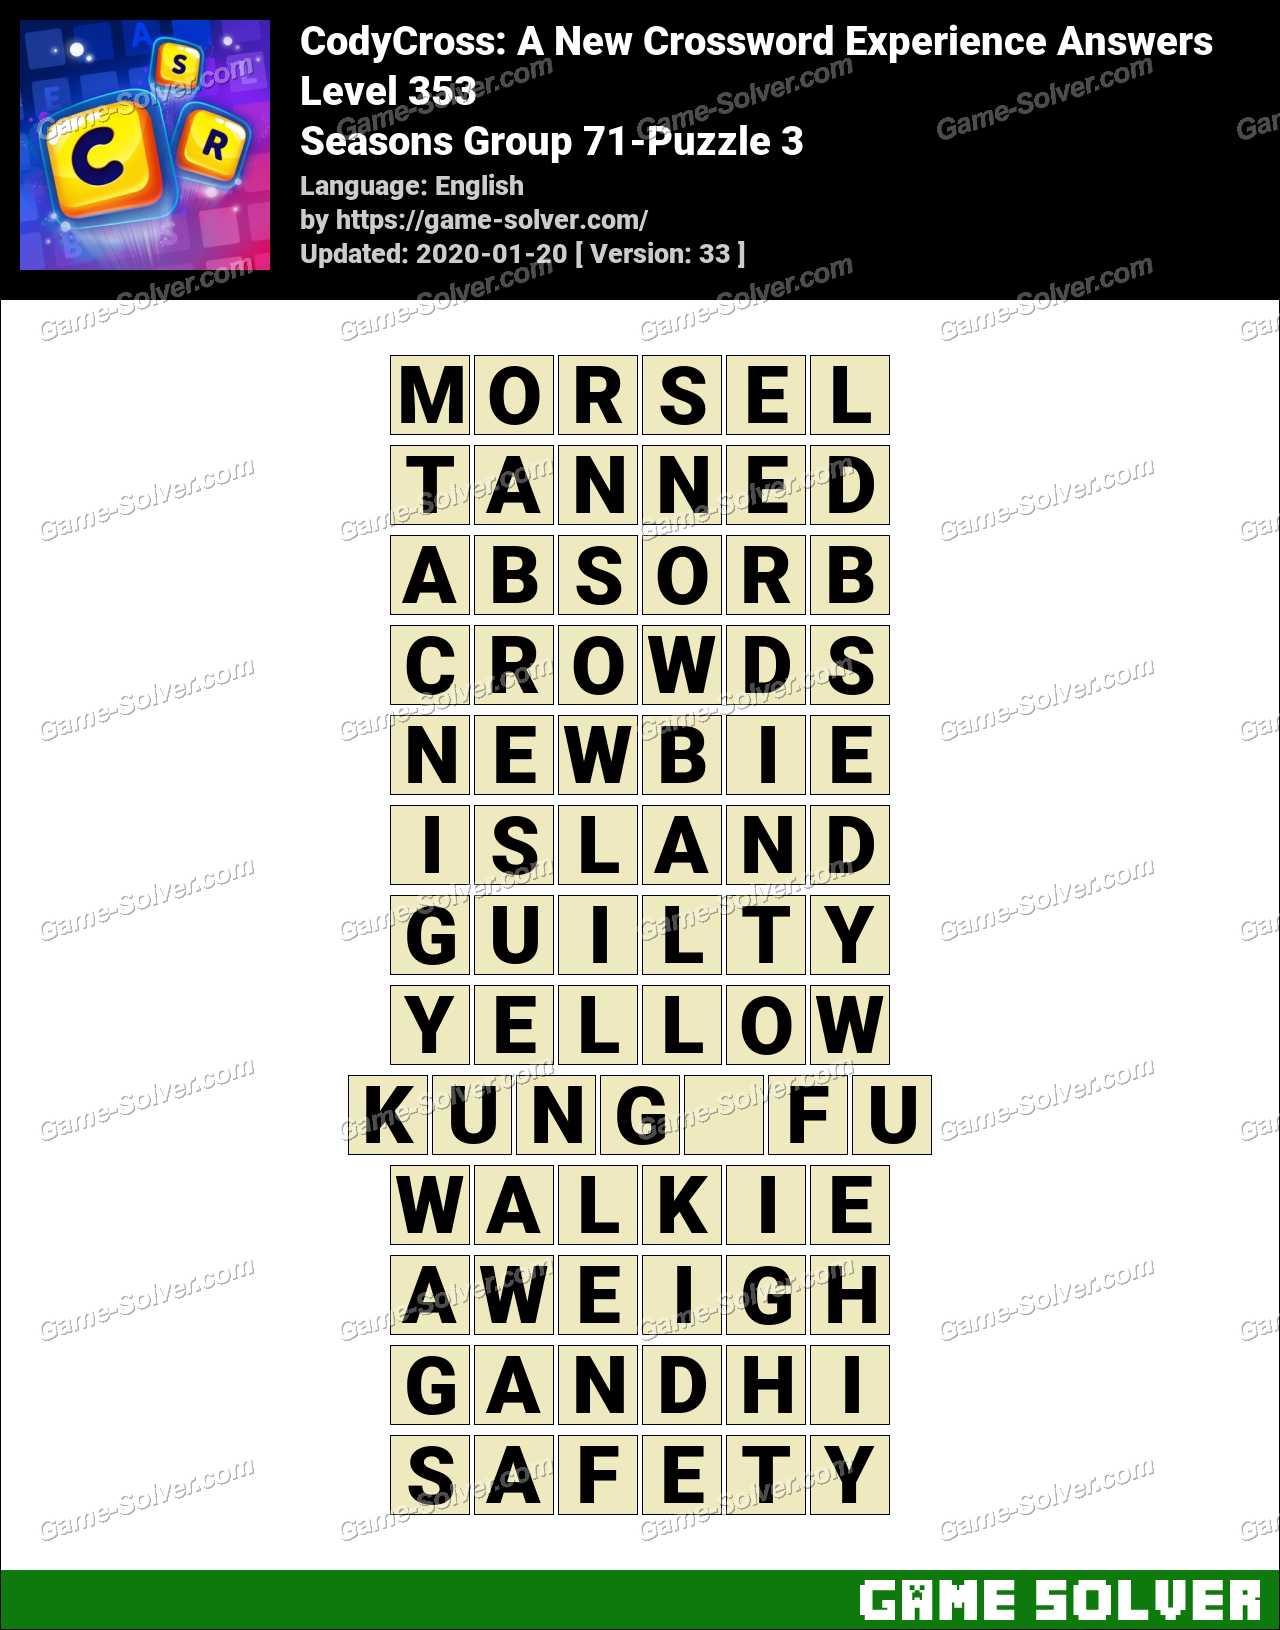 CodyCross Seasons Group 71-Puzzle 3 Answers